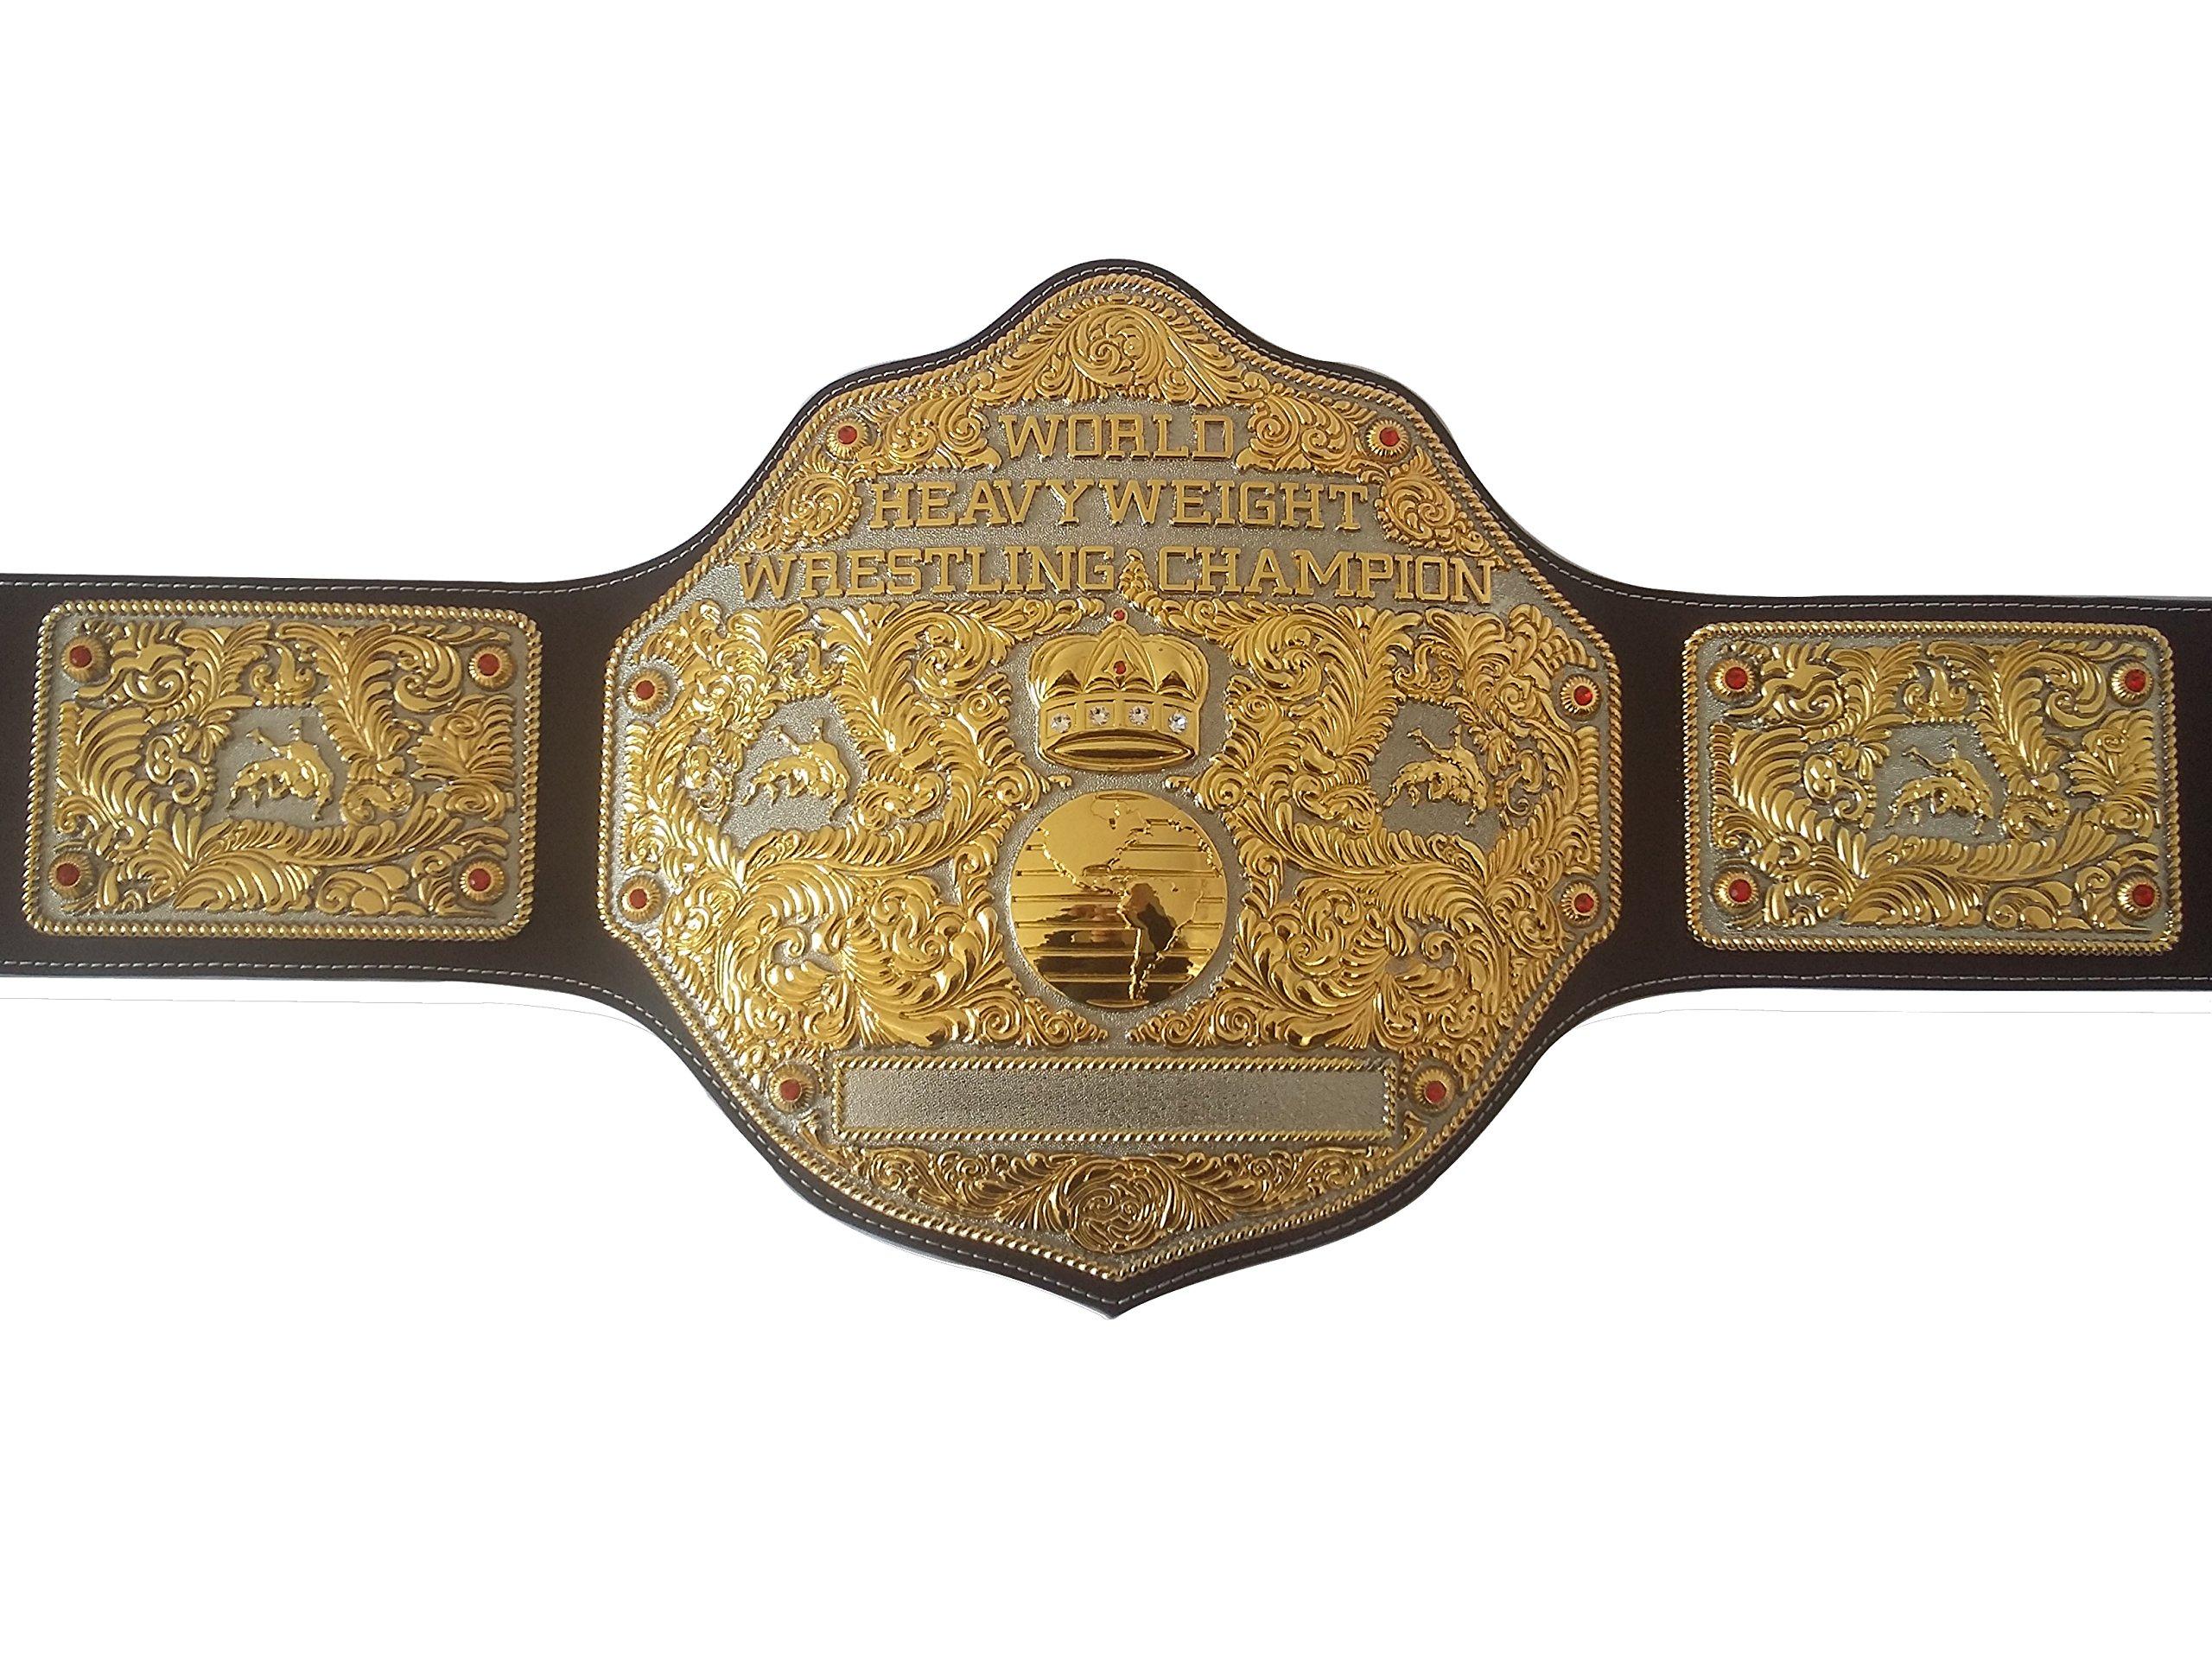 Fandu Belts Adult Nickel Gold Big Gold Championship Belt Title 8mm Thick by Fandu Belts